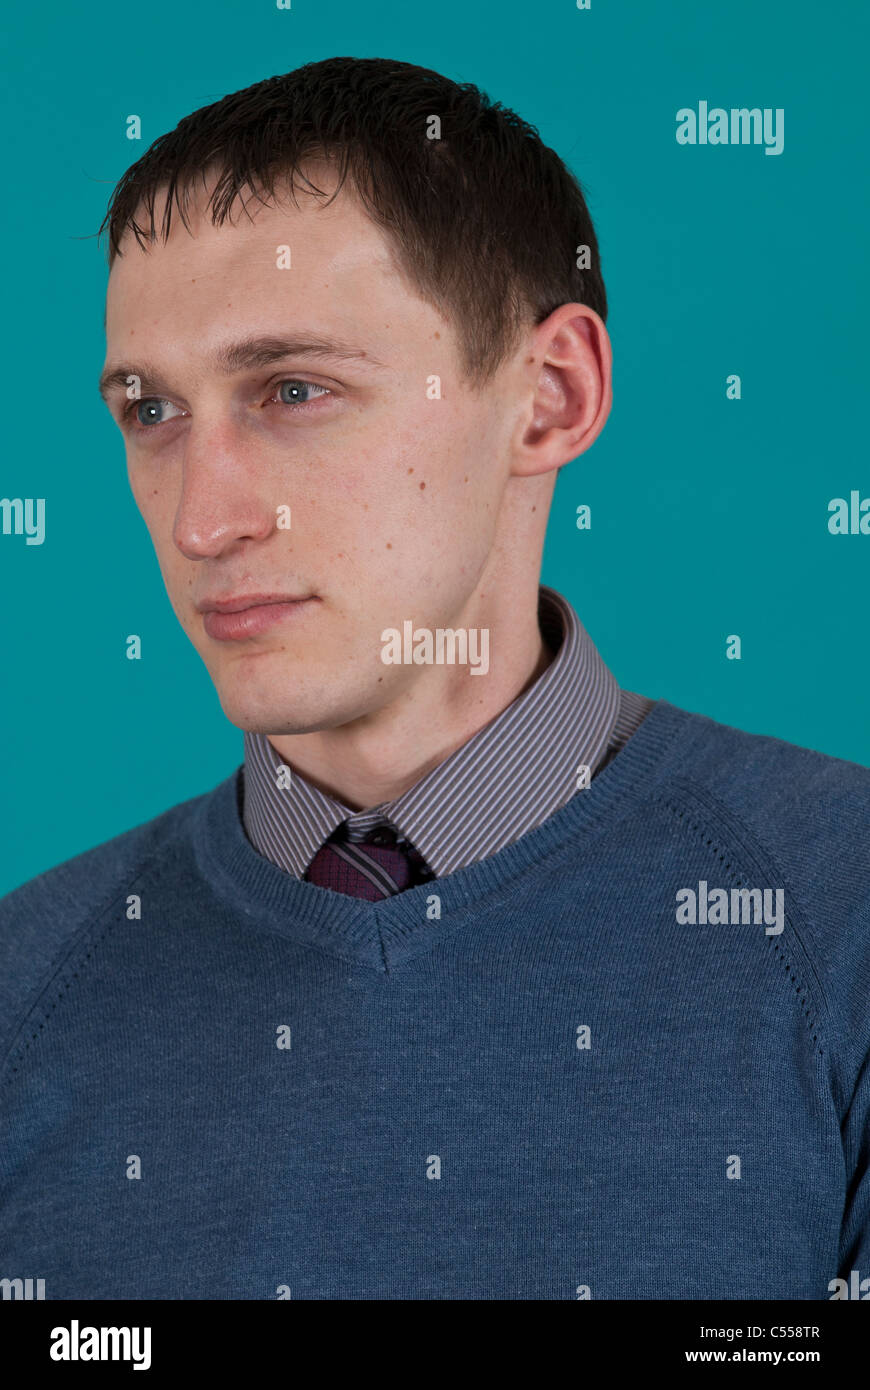 Young polish man looking away Stock Photo - Alamy